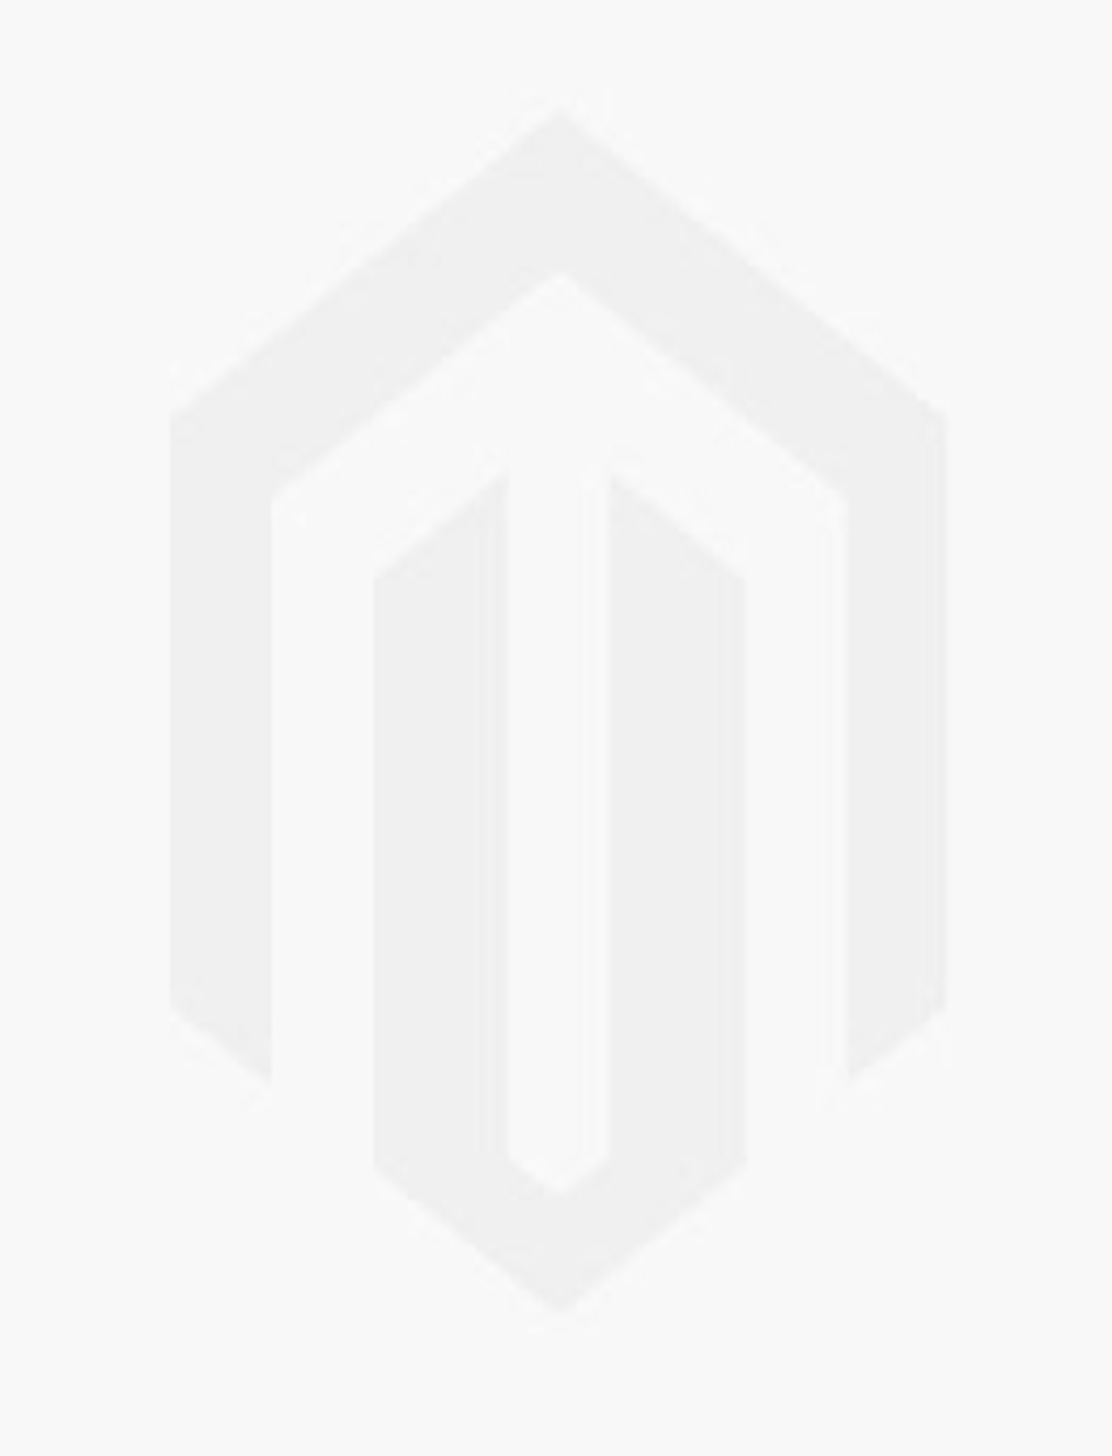 Opal and Diamond MT Tiara Tradtional Stud Image #1